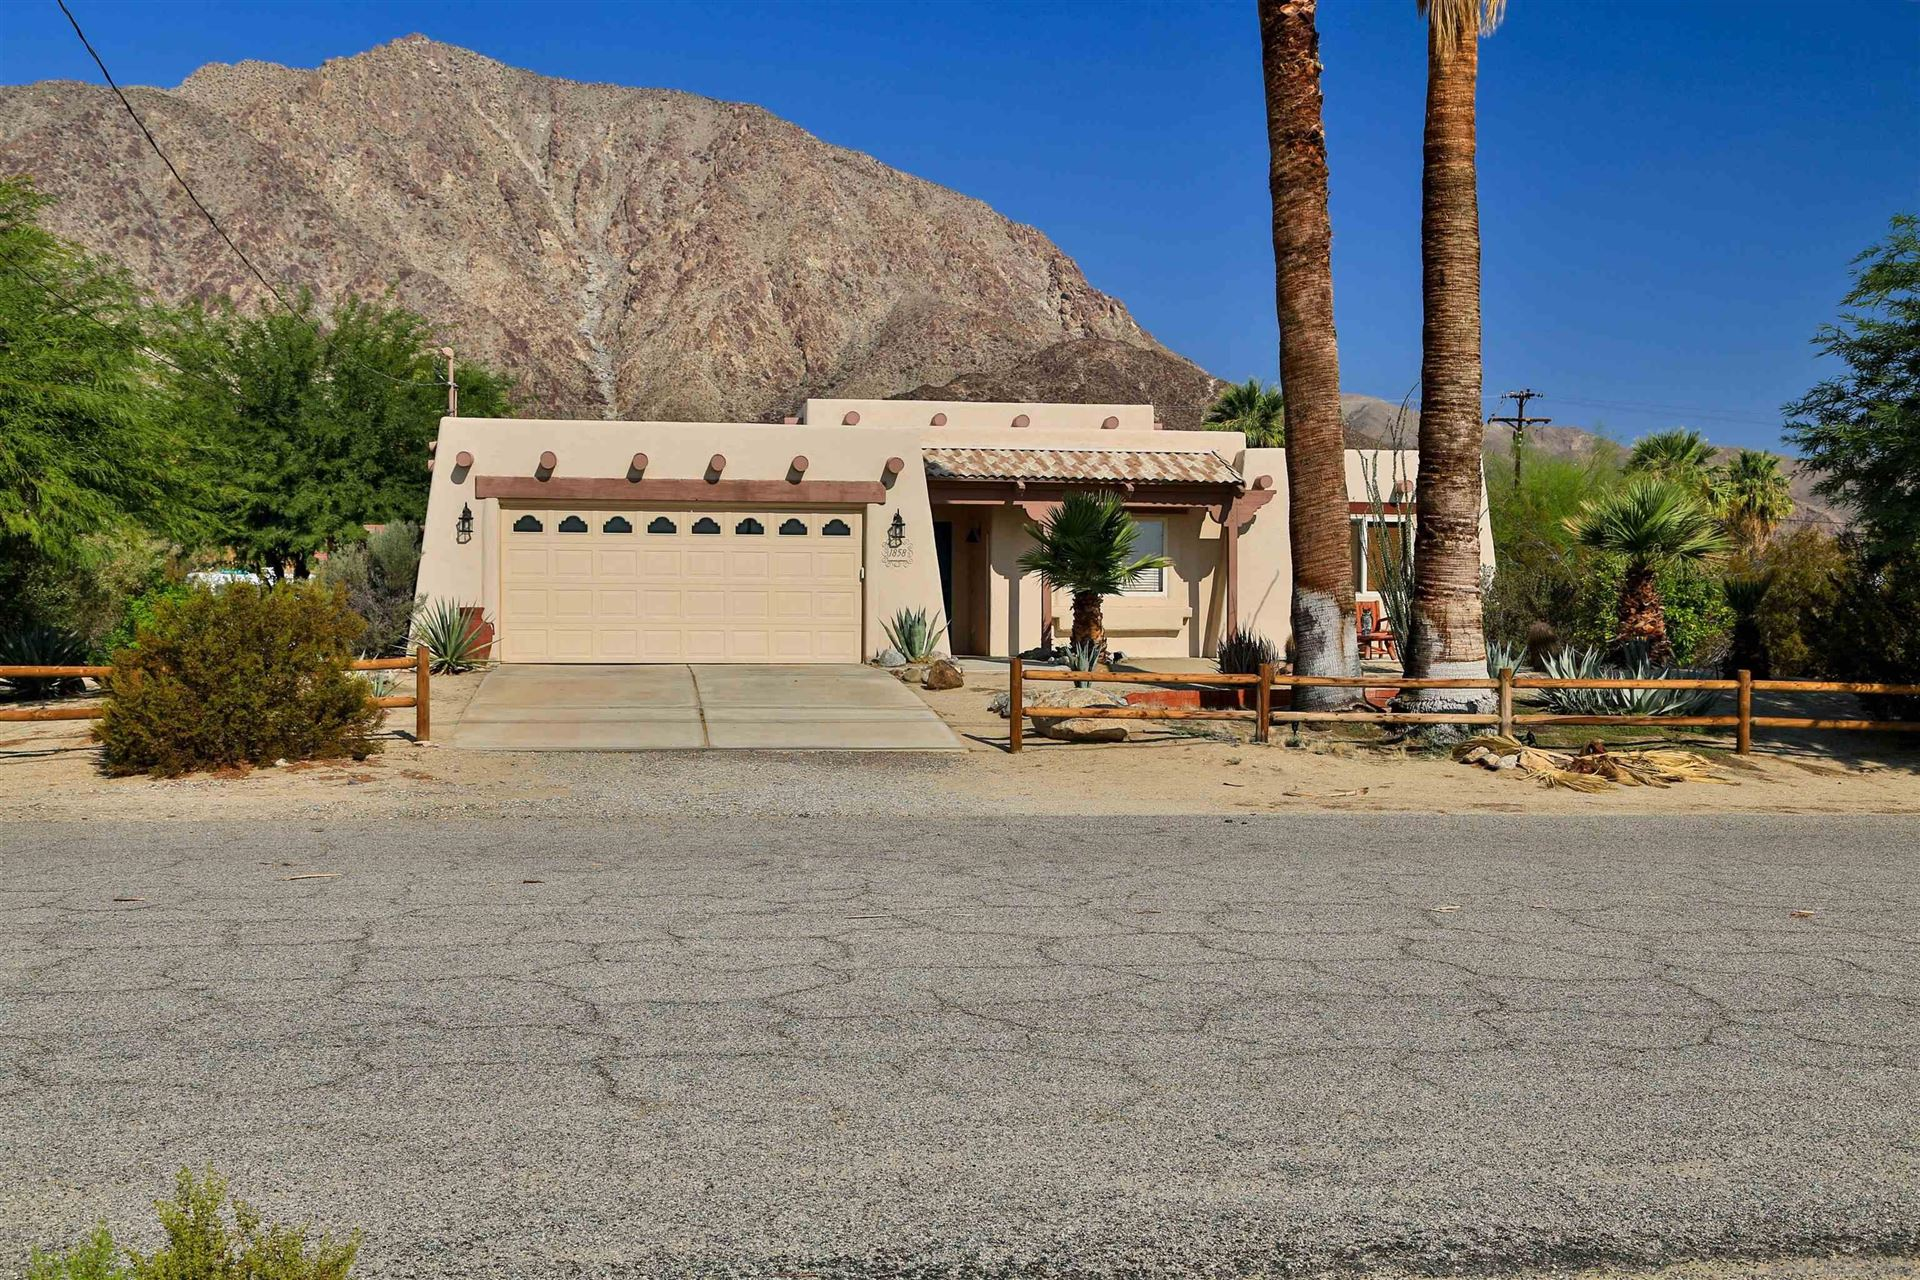 Photo of 1858 Hauberk Dr, Borrego Springs, CA 92004 (MLS # 210025962)